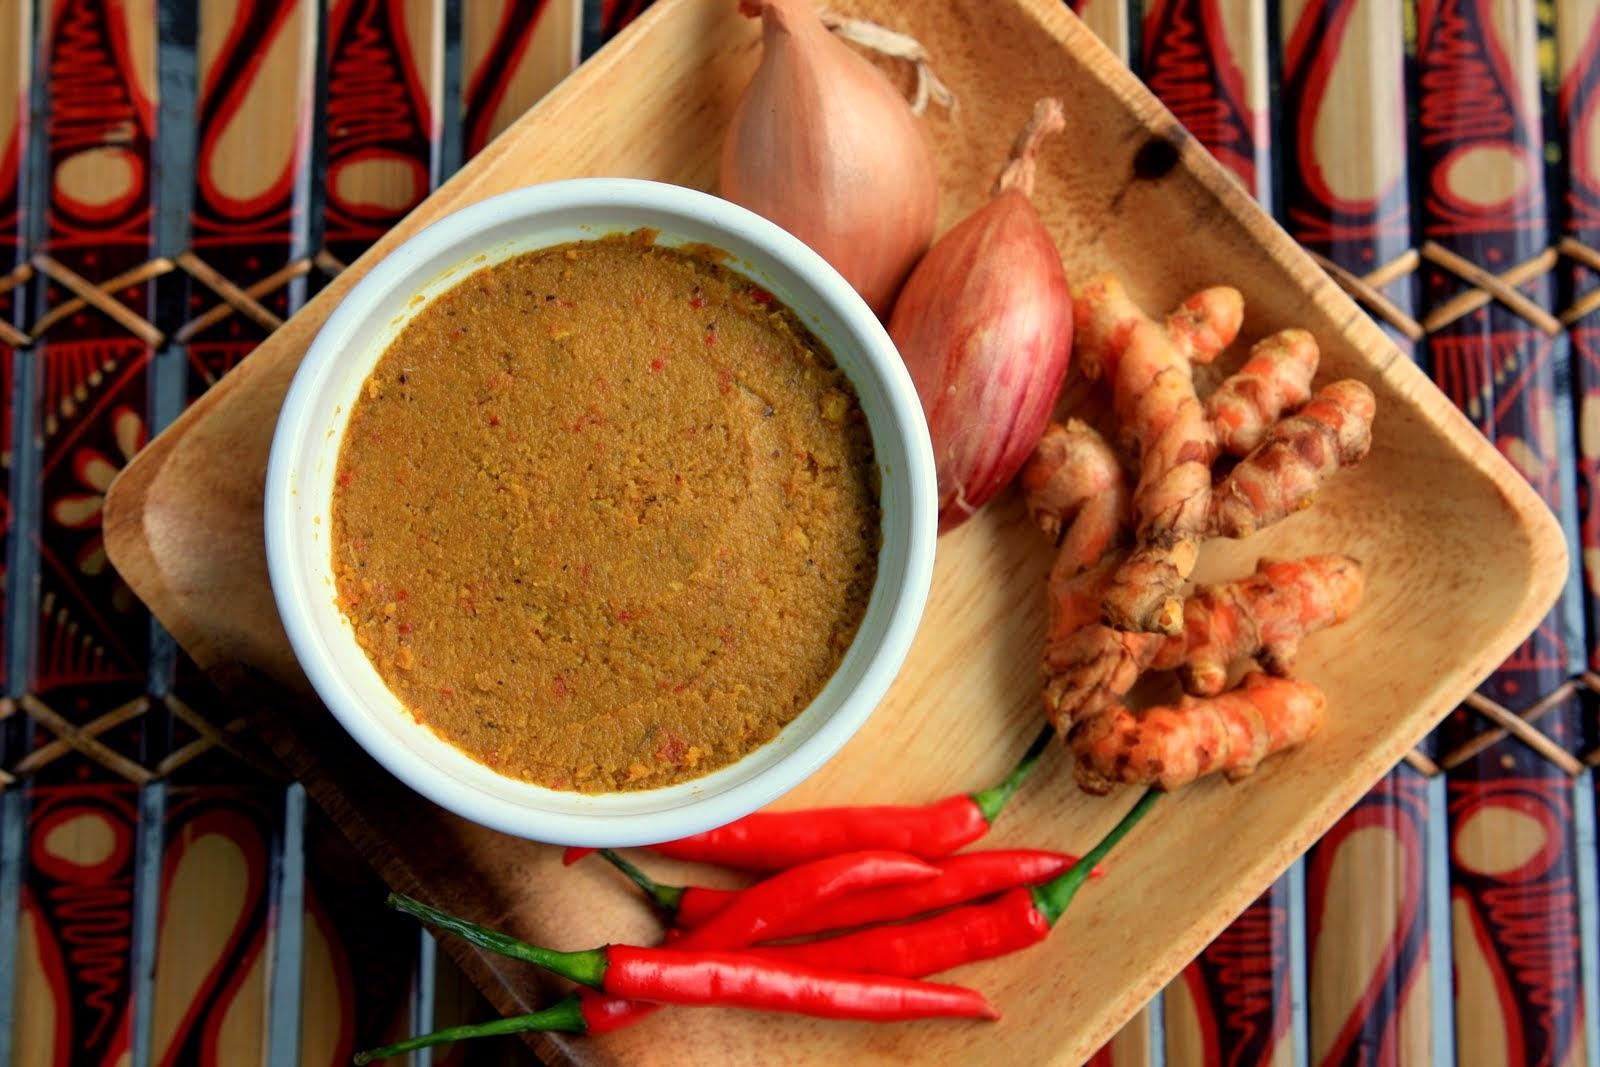 Bumbu Ayam Bali [Balinese Spice Base for Poultry]